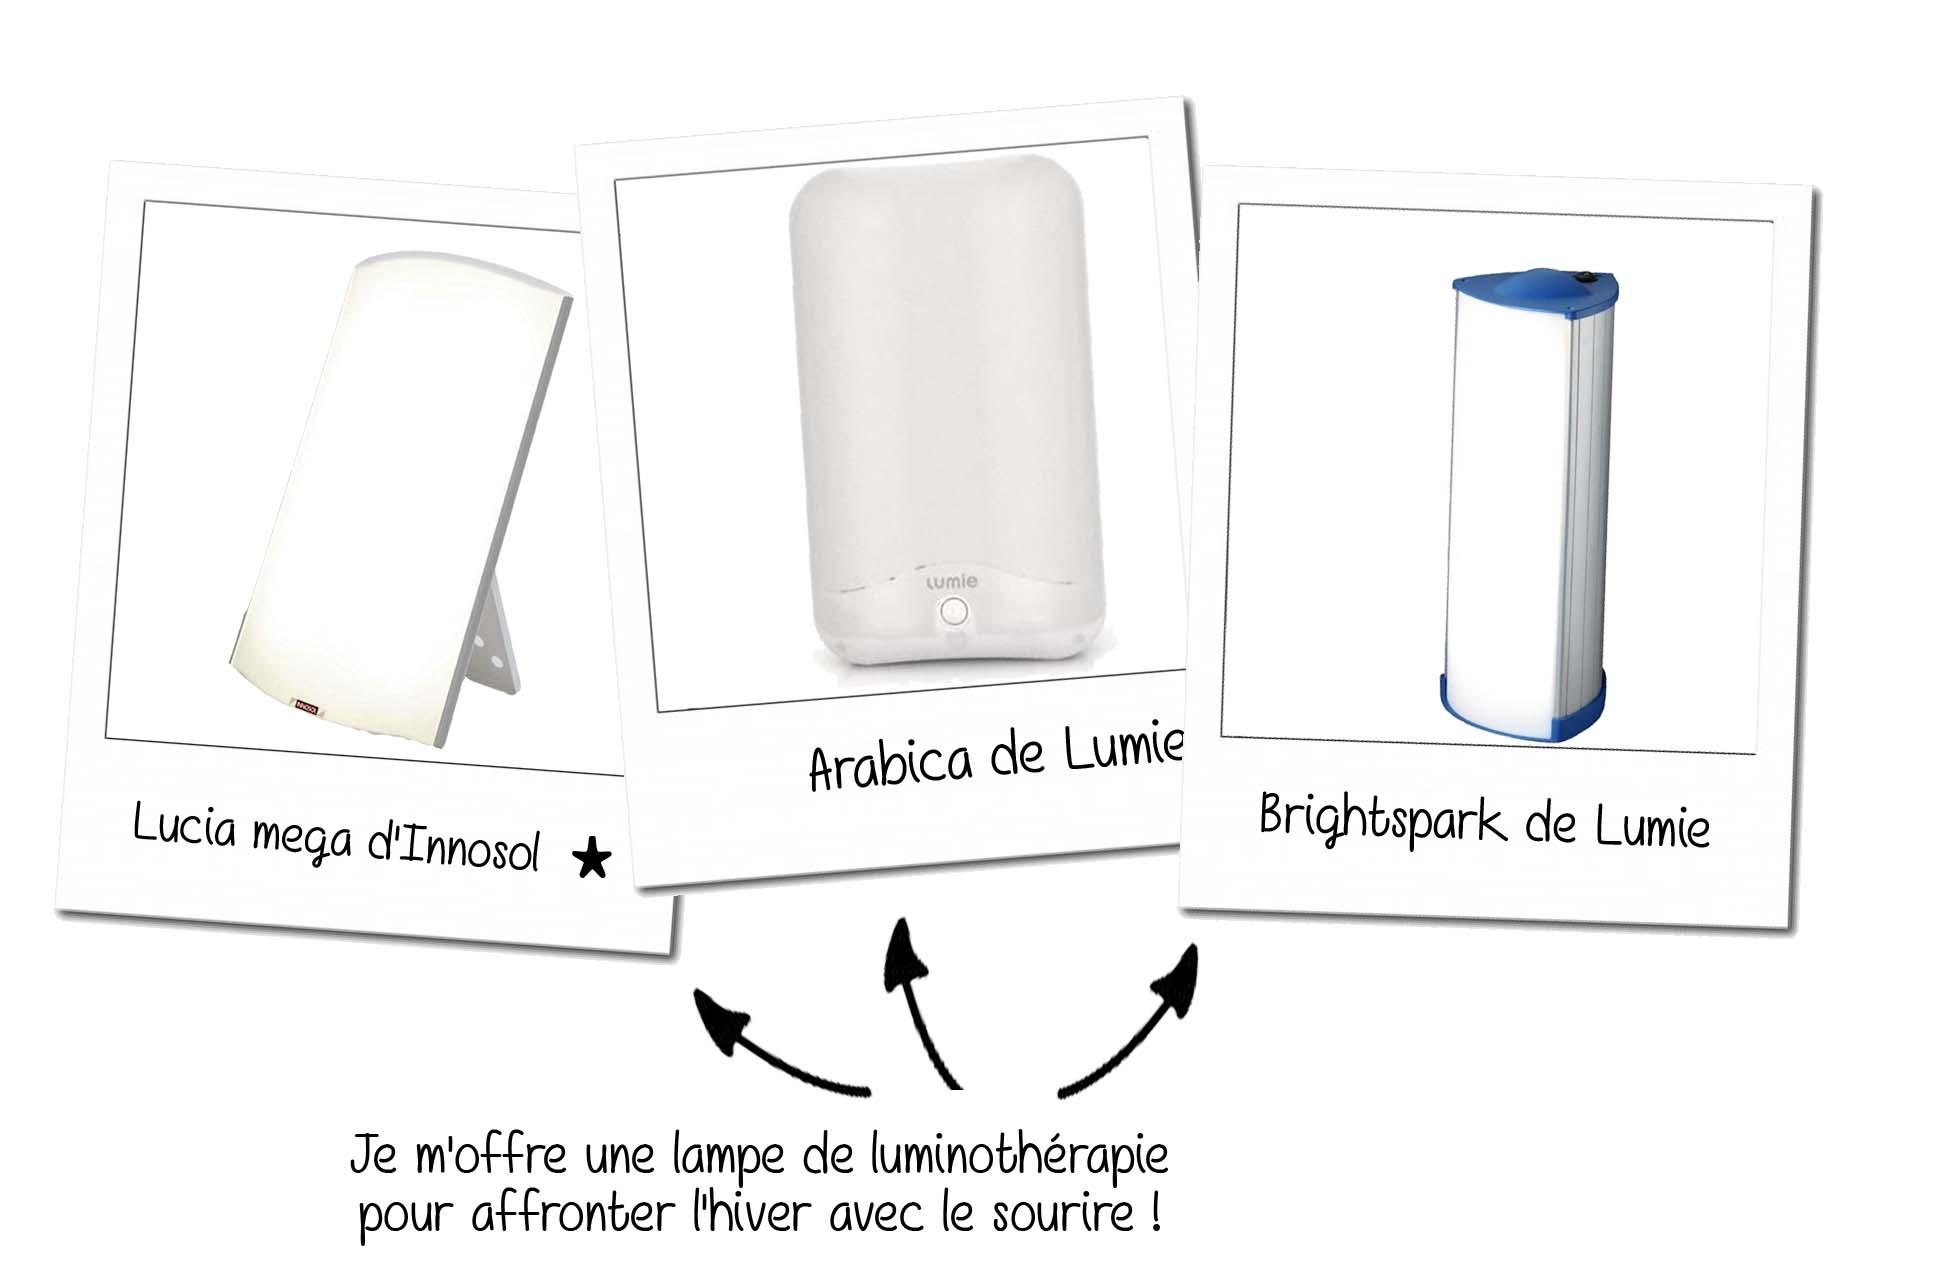 lampe de luminotherapie bien tre et anti depression. Black Bedroom Furniture Sets. Home Design Ideas